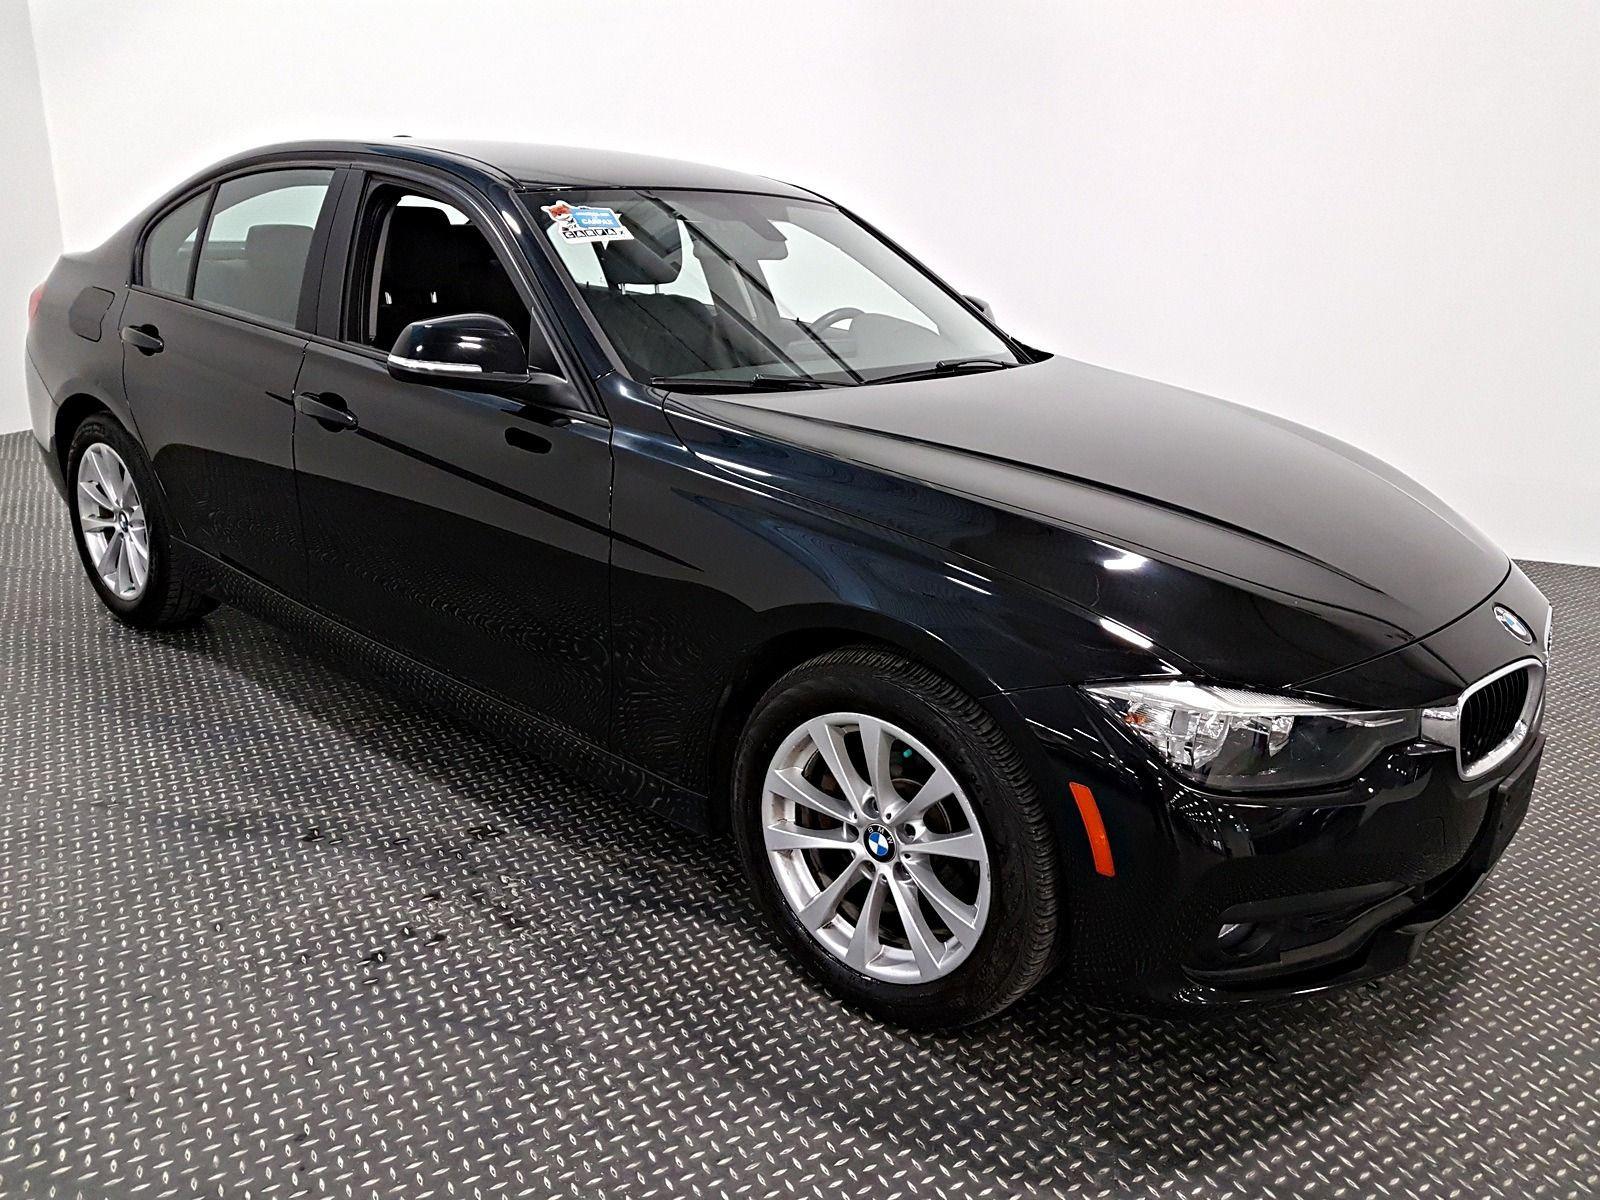 2016 BMW 3 Series 320i xDrive 4X4 Automatique - A/C - Cuir - Sièges Chauffants